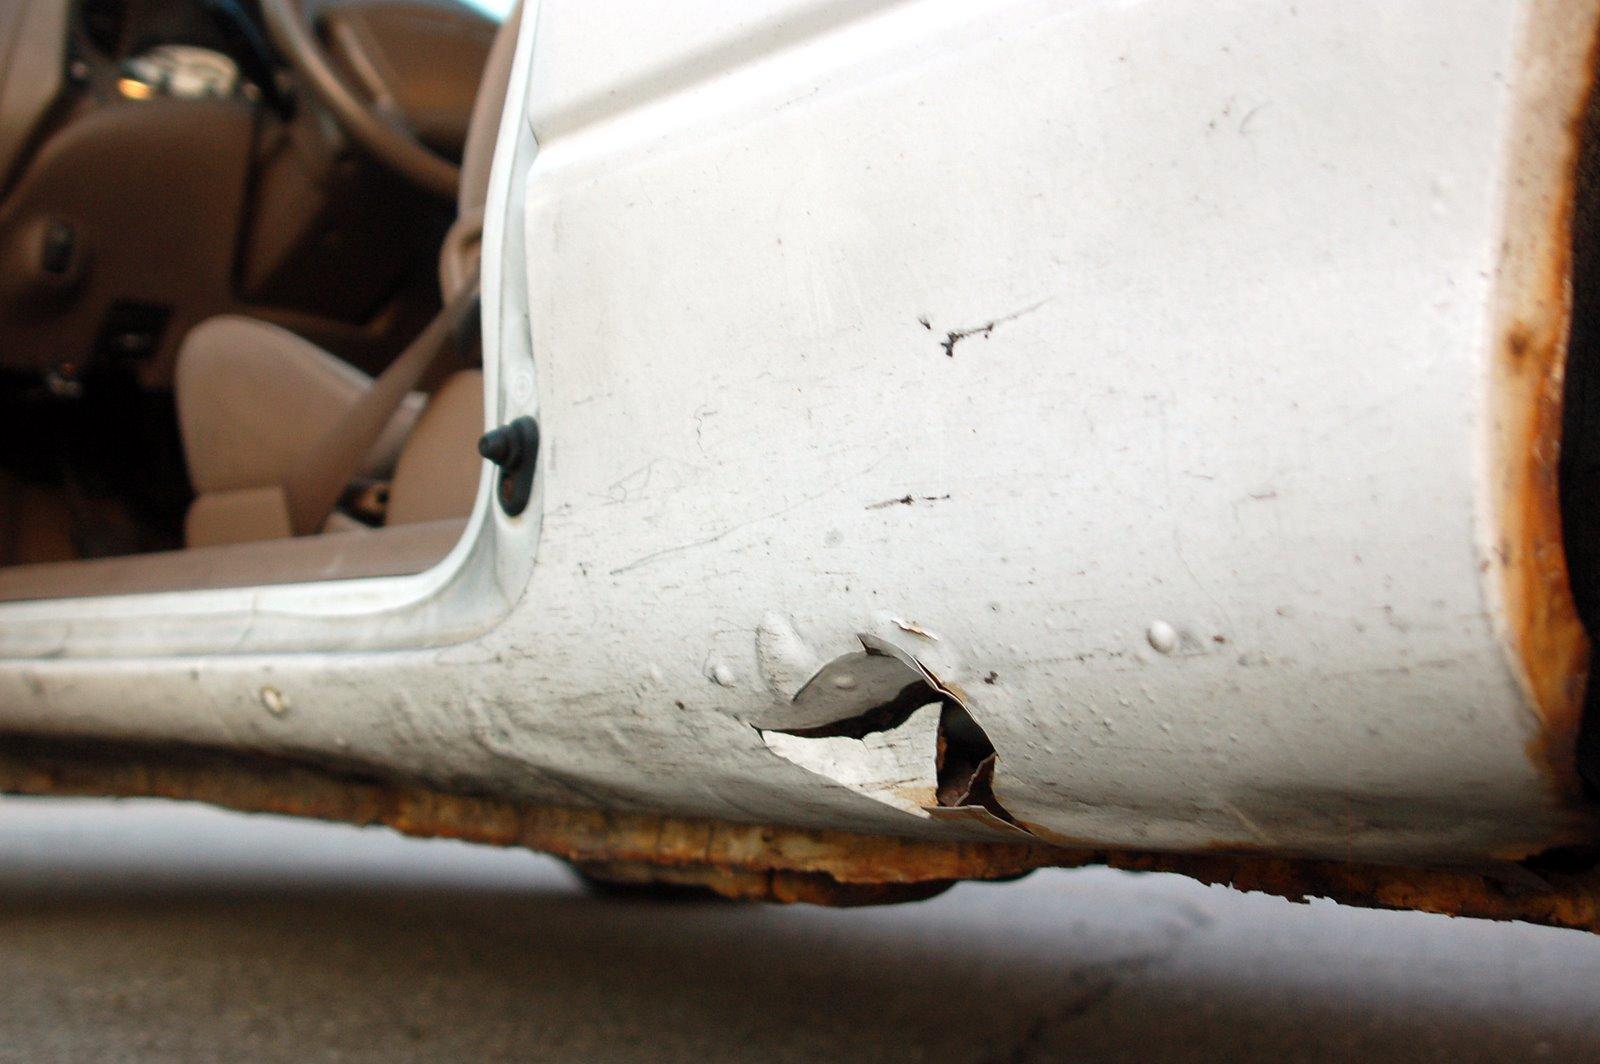 Rust Repair: Zx2 Rust Repair